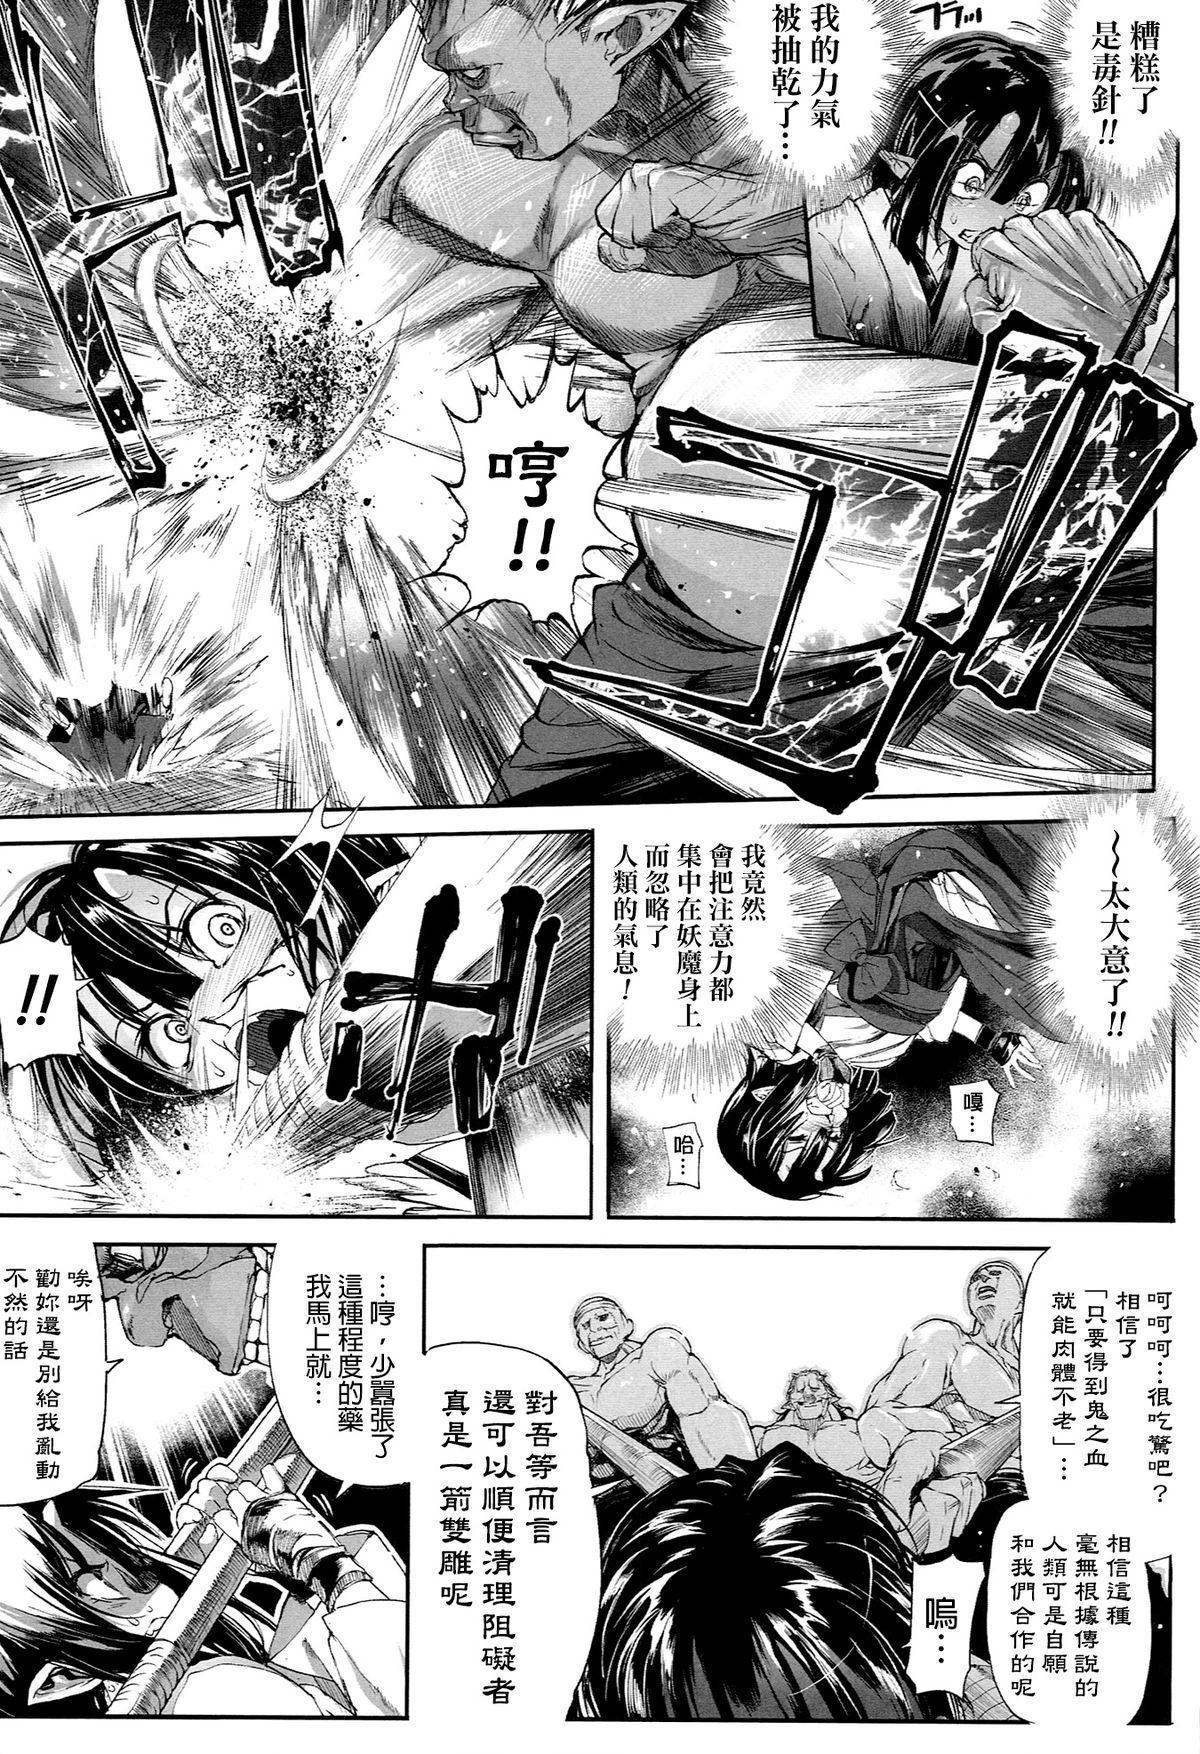 Onibana Muzan 8